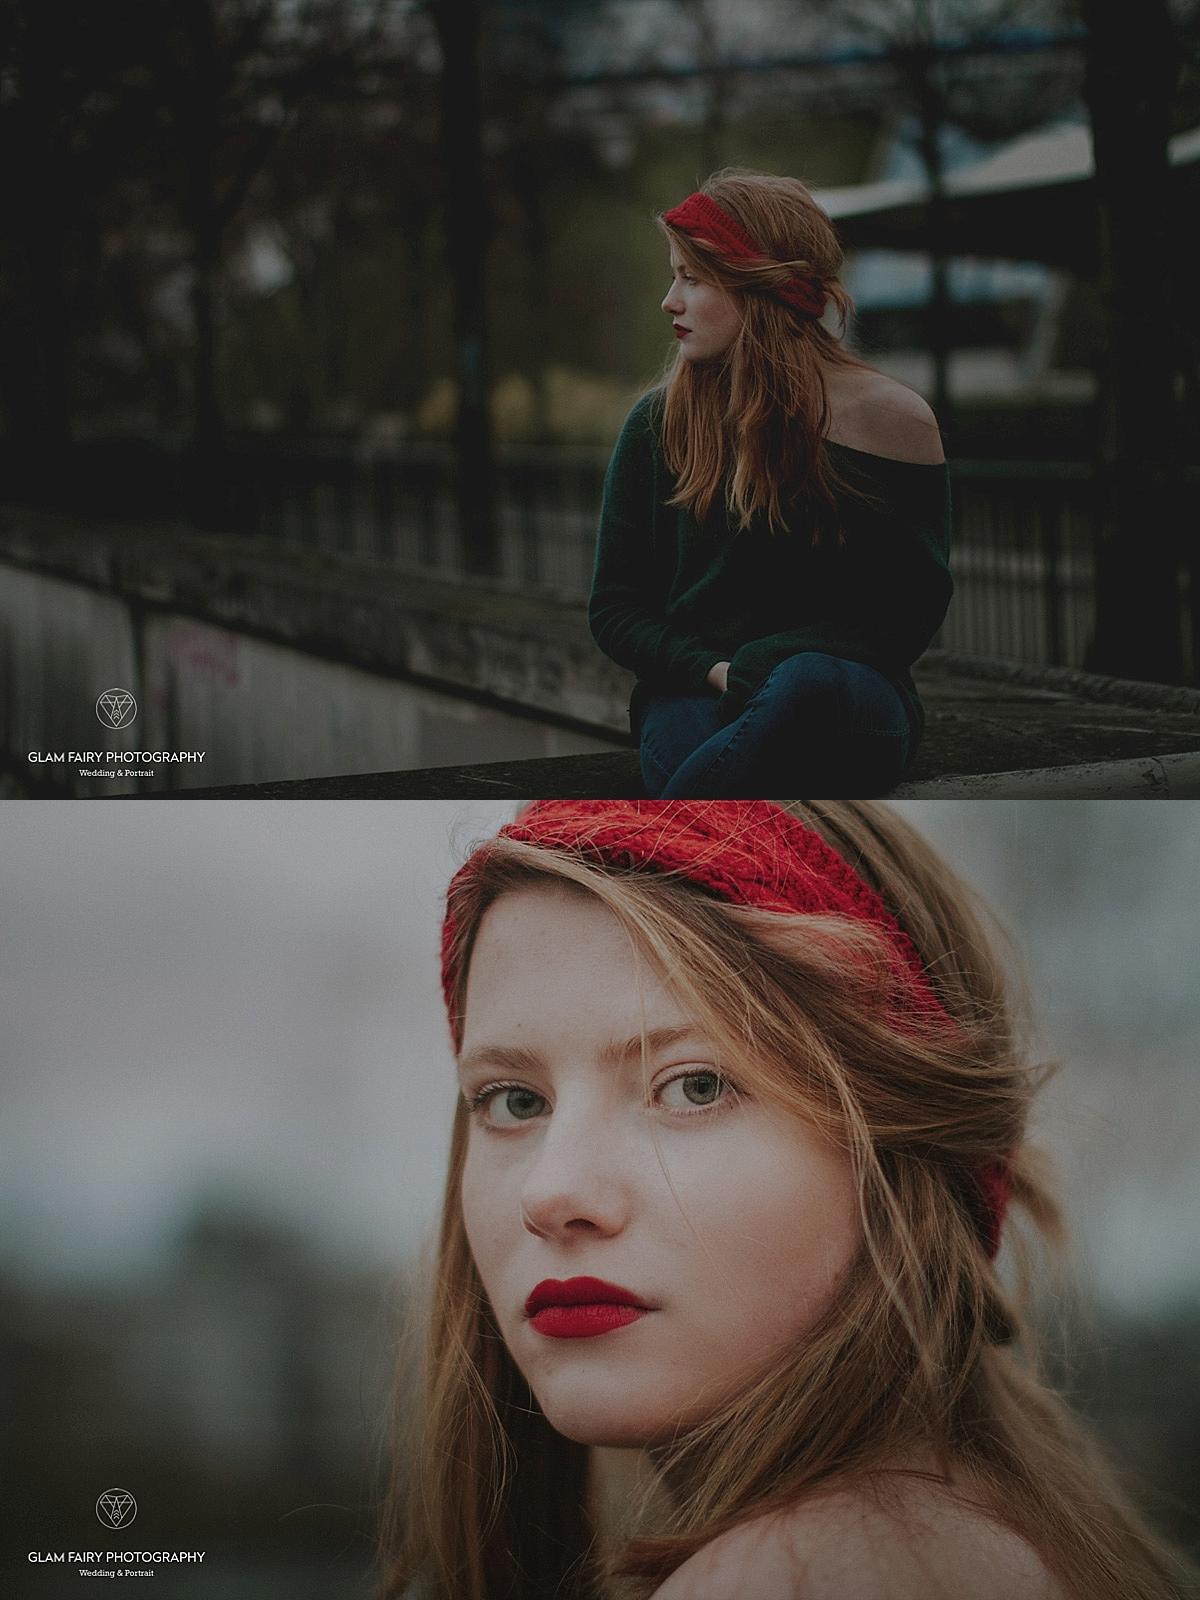 GlamFairyPhotography-seance-portrait-femme-bnf-mona_0016